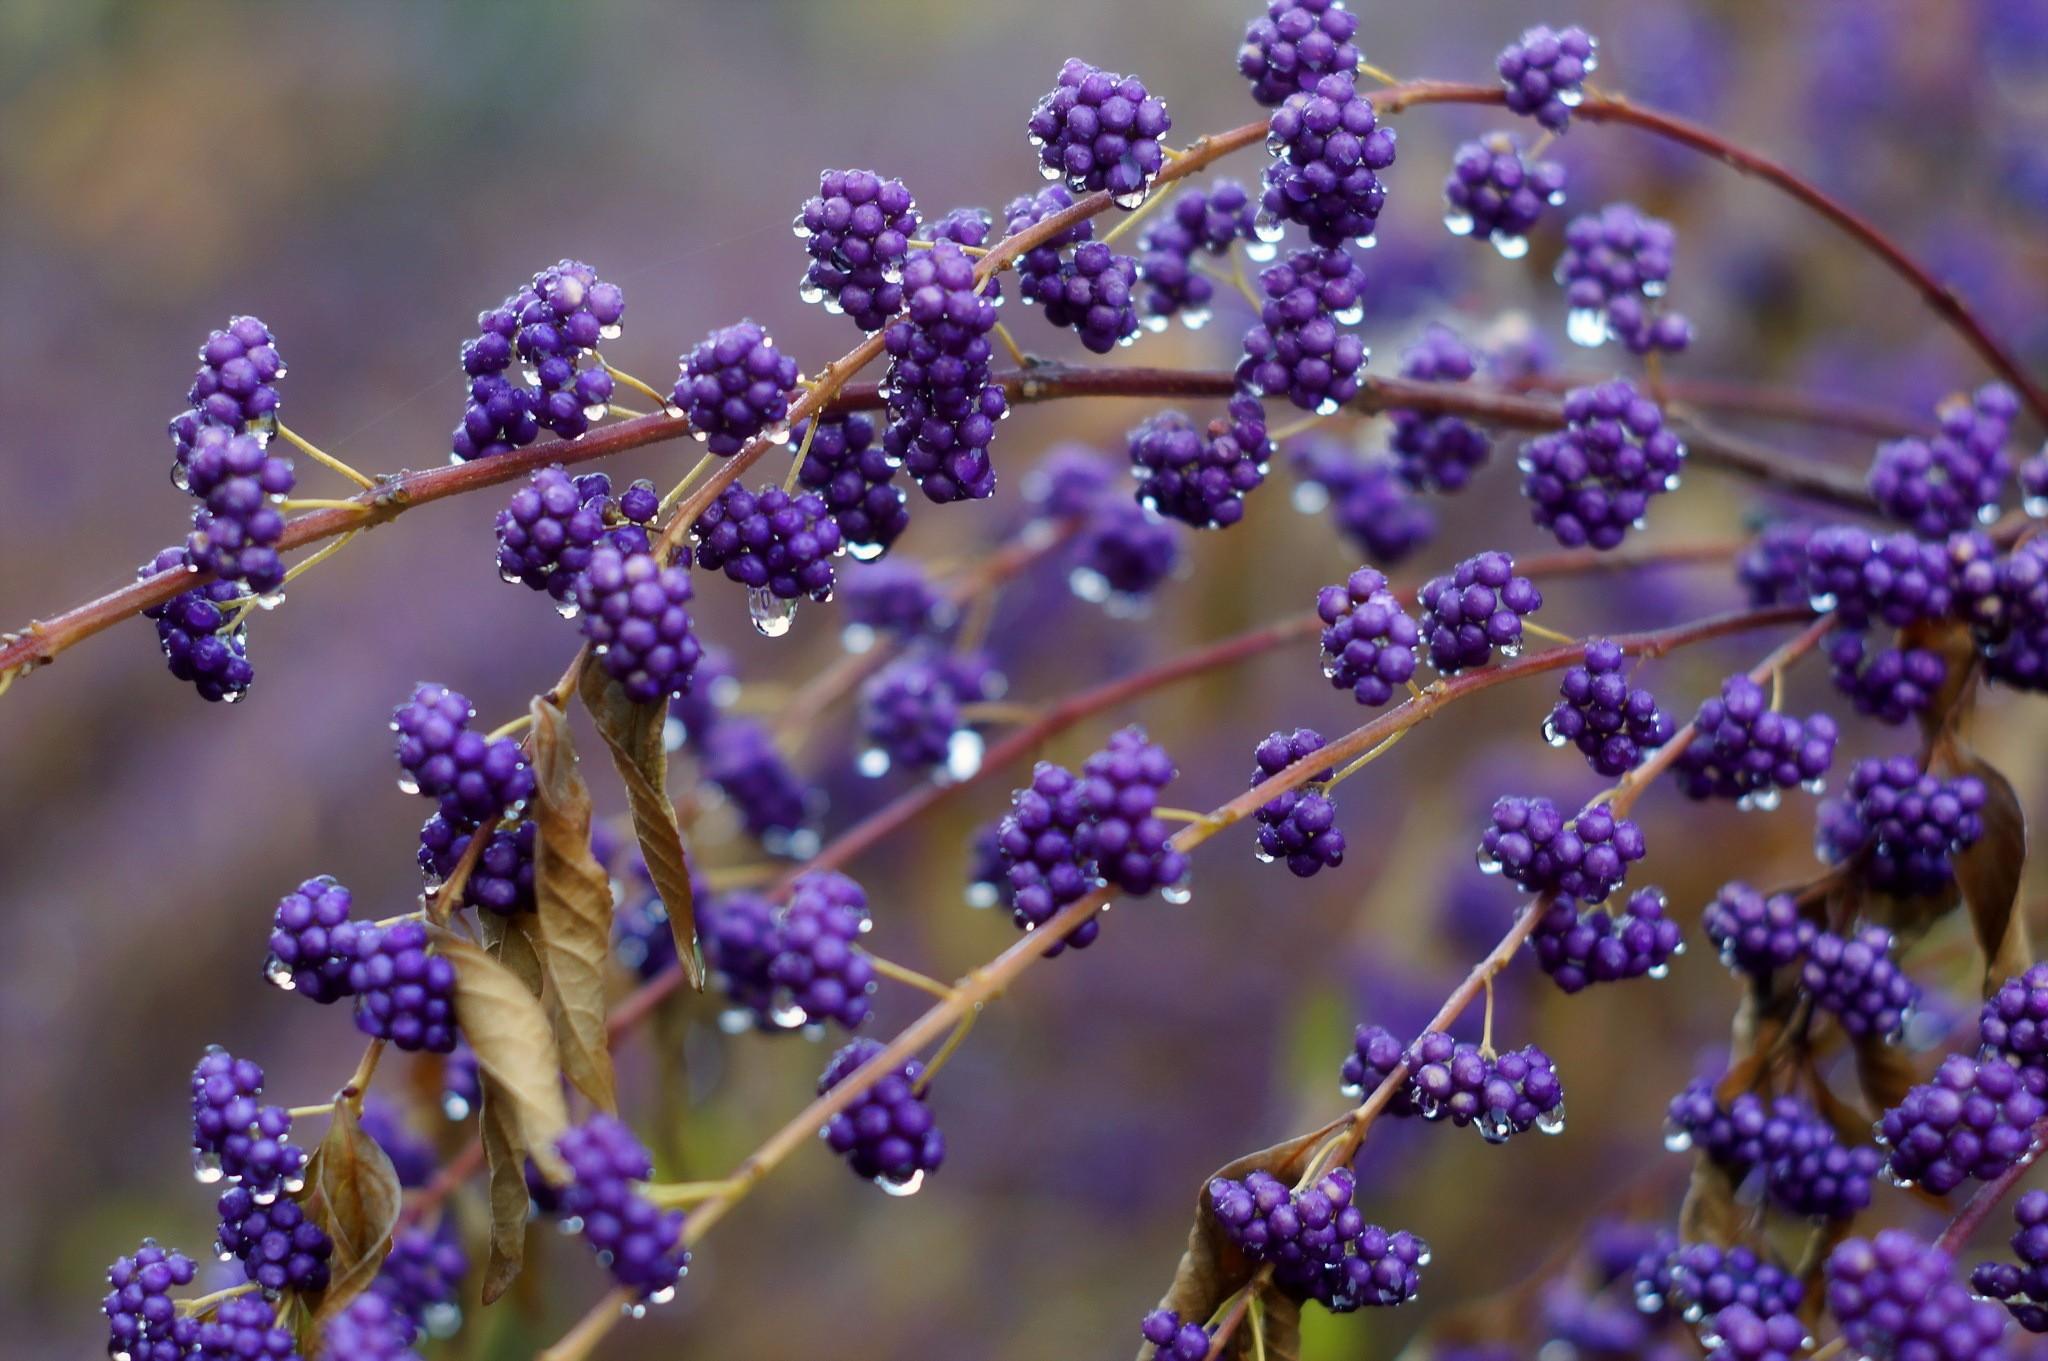 hintergrundbilder pflanzen lila makro lavendel. Black Bedroom Furniture Sets. Home Design Ideas